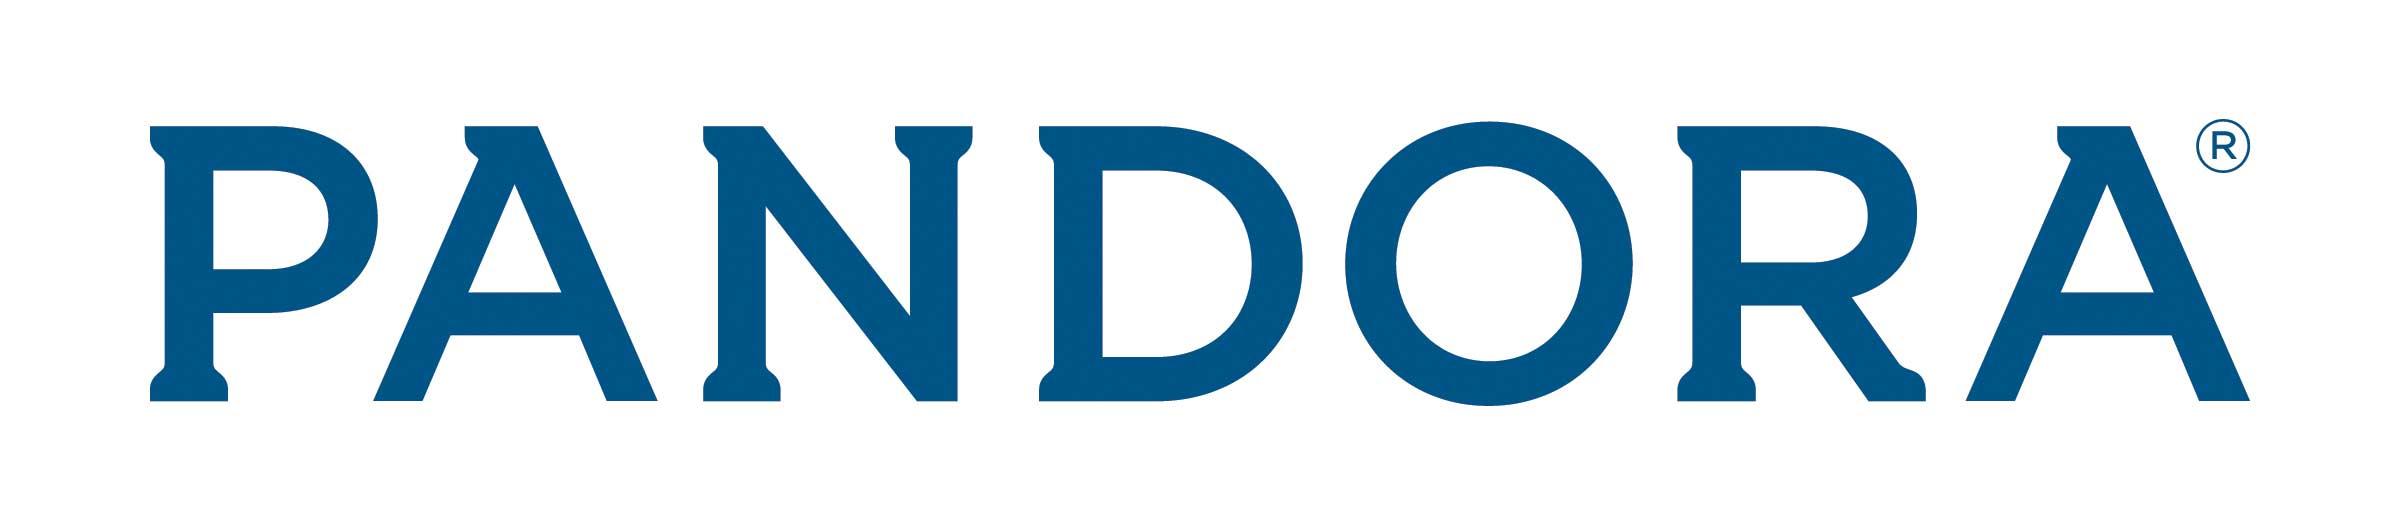 pandora_logo_blue.jpg